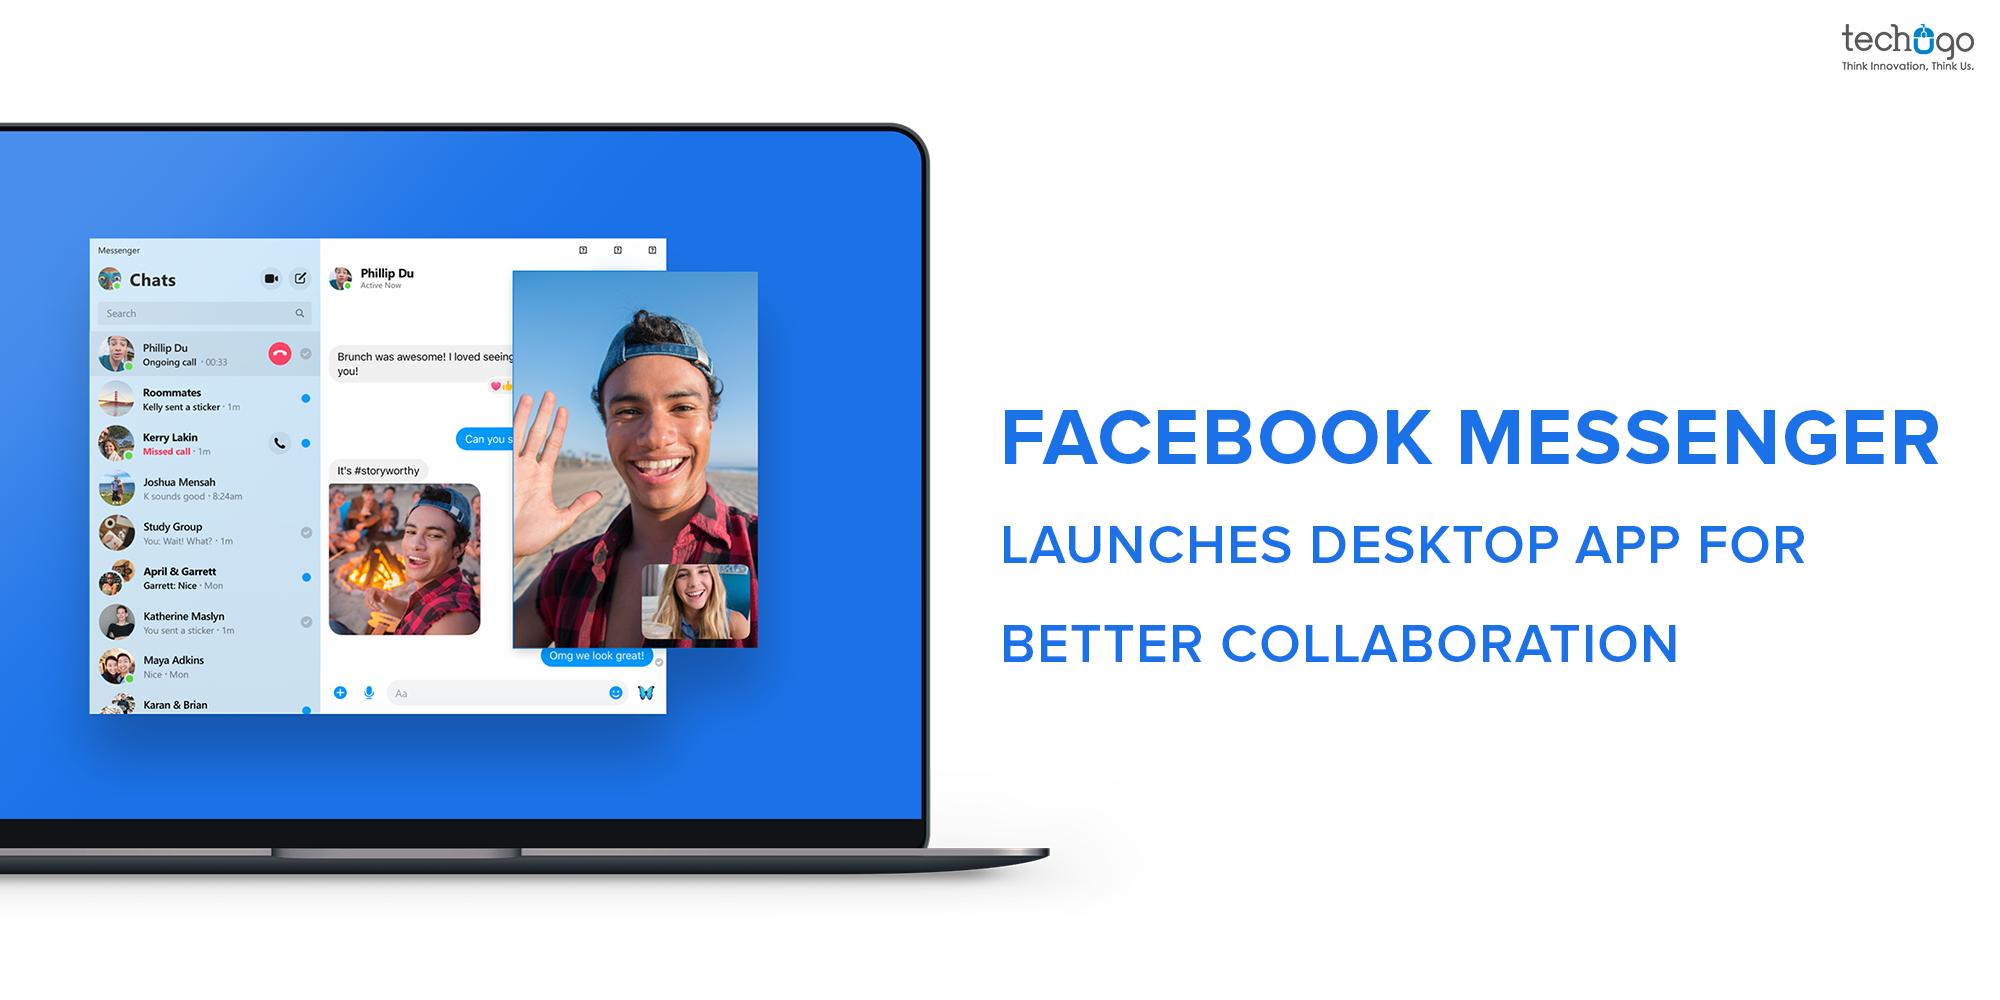 Access smooth collaboration with Facebook messenger desktop app